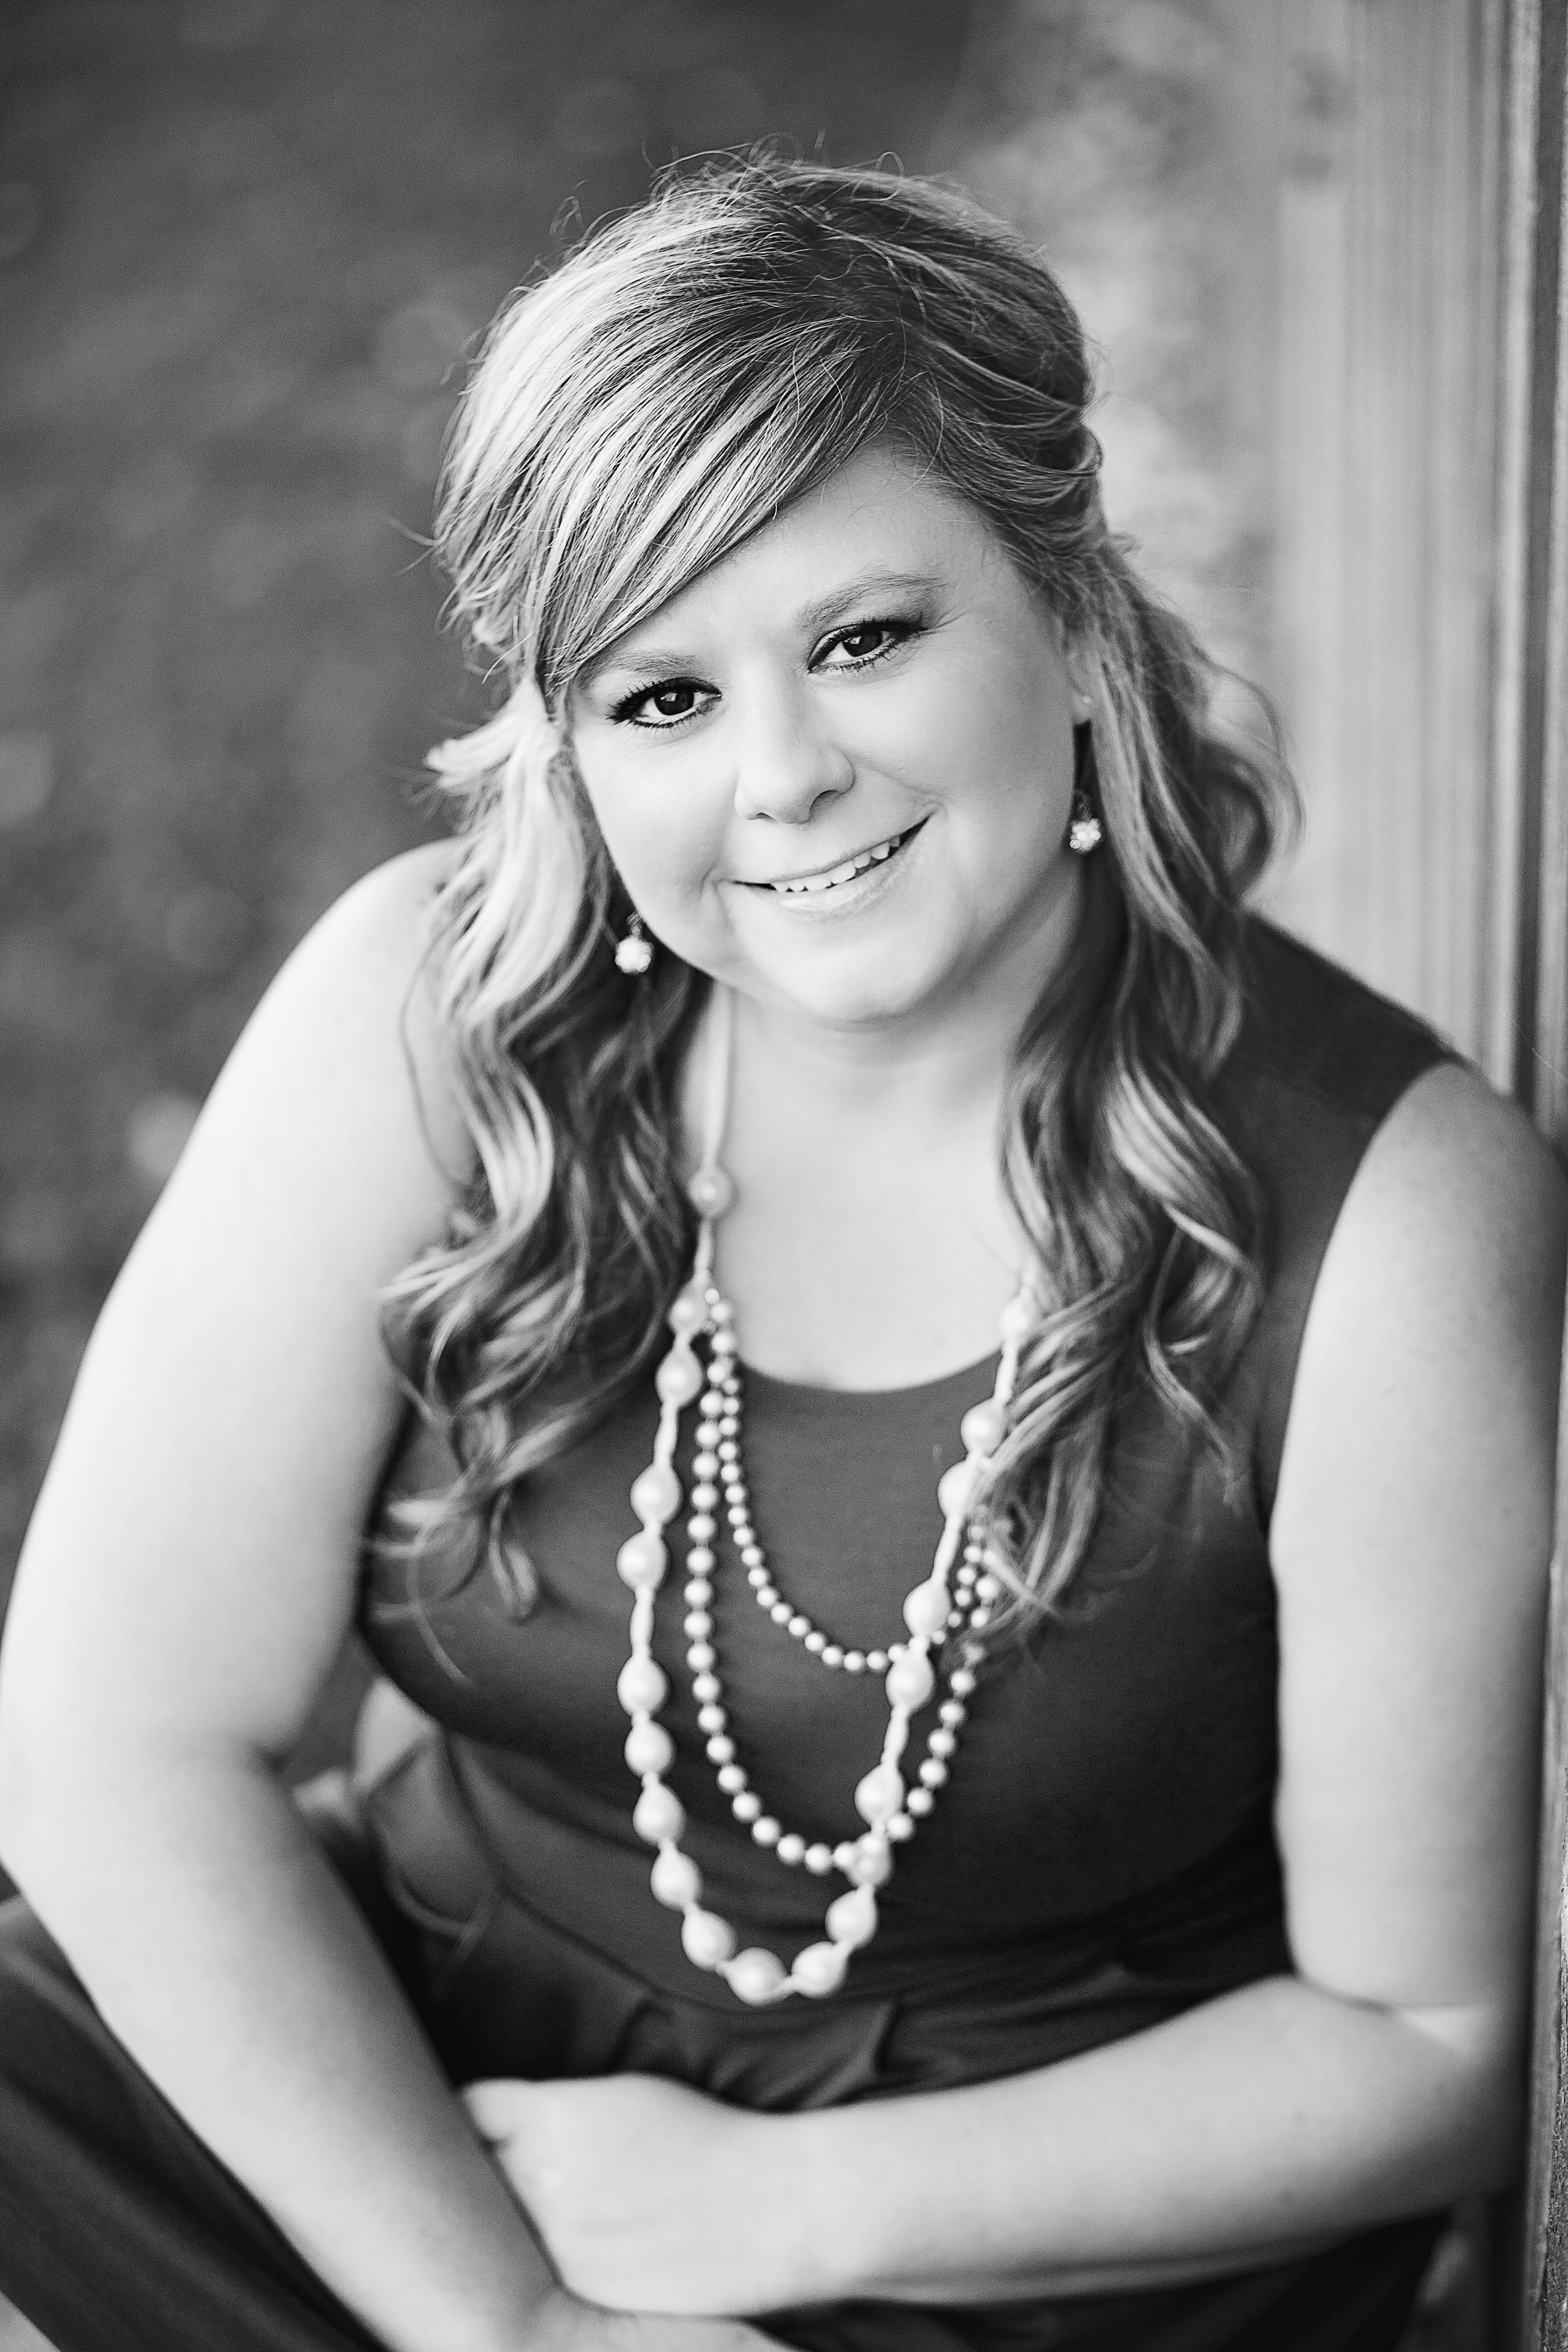 Brooke L